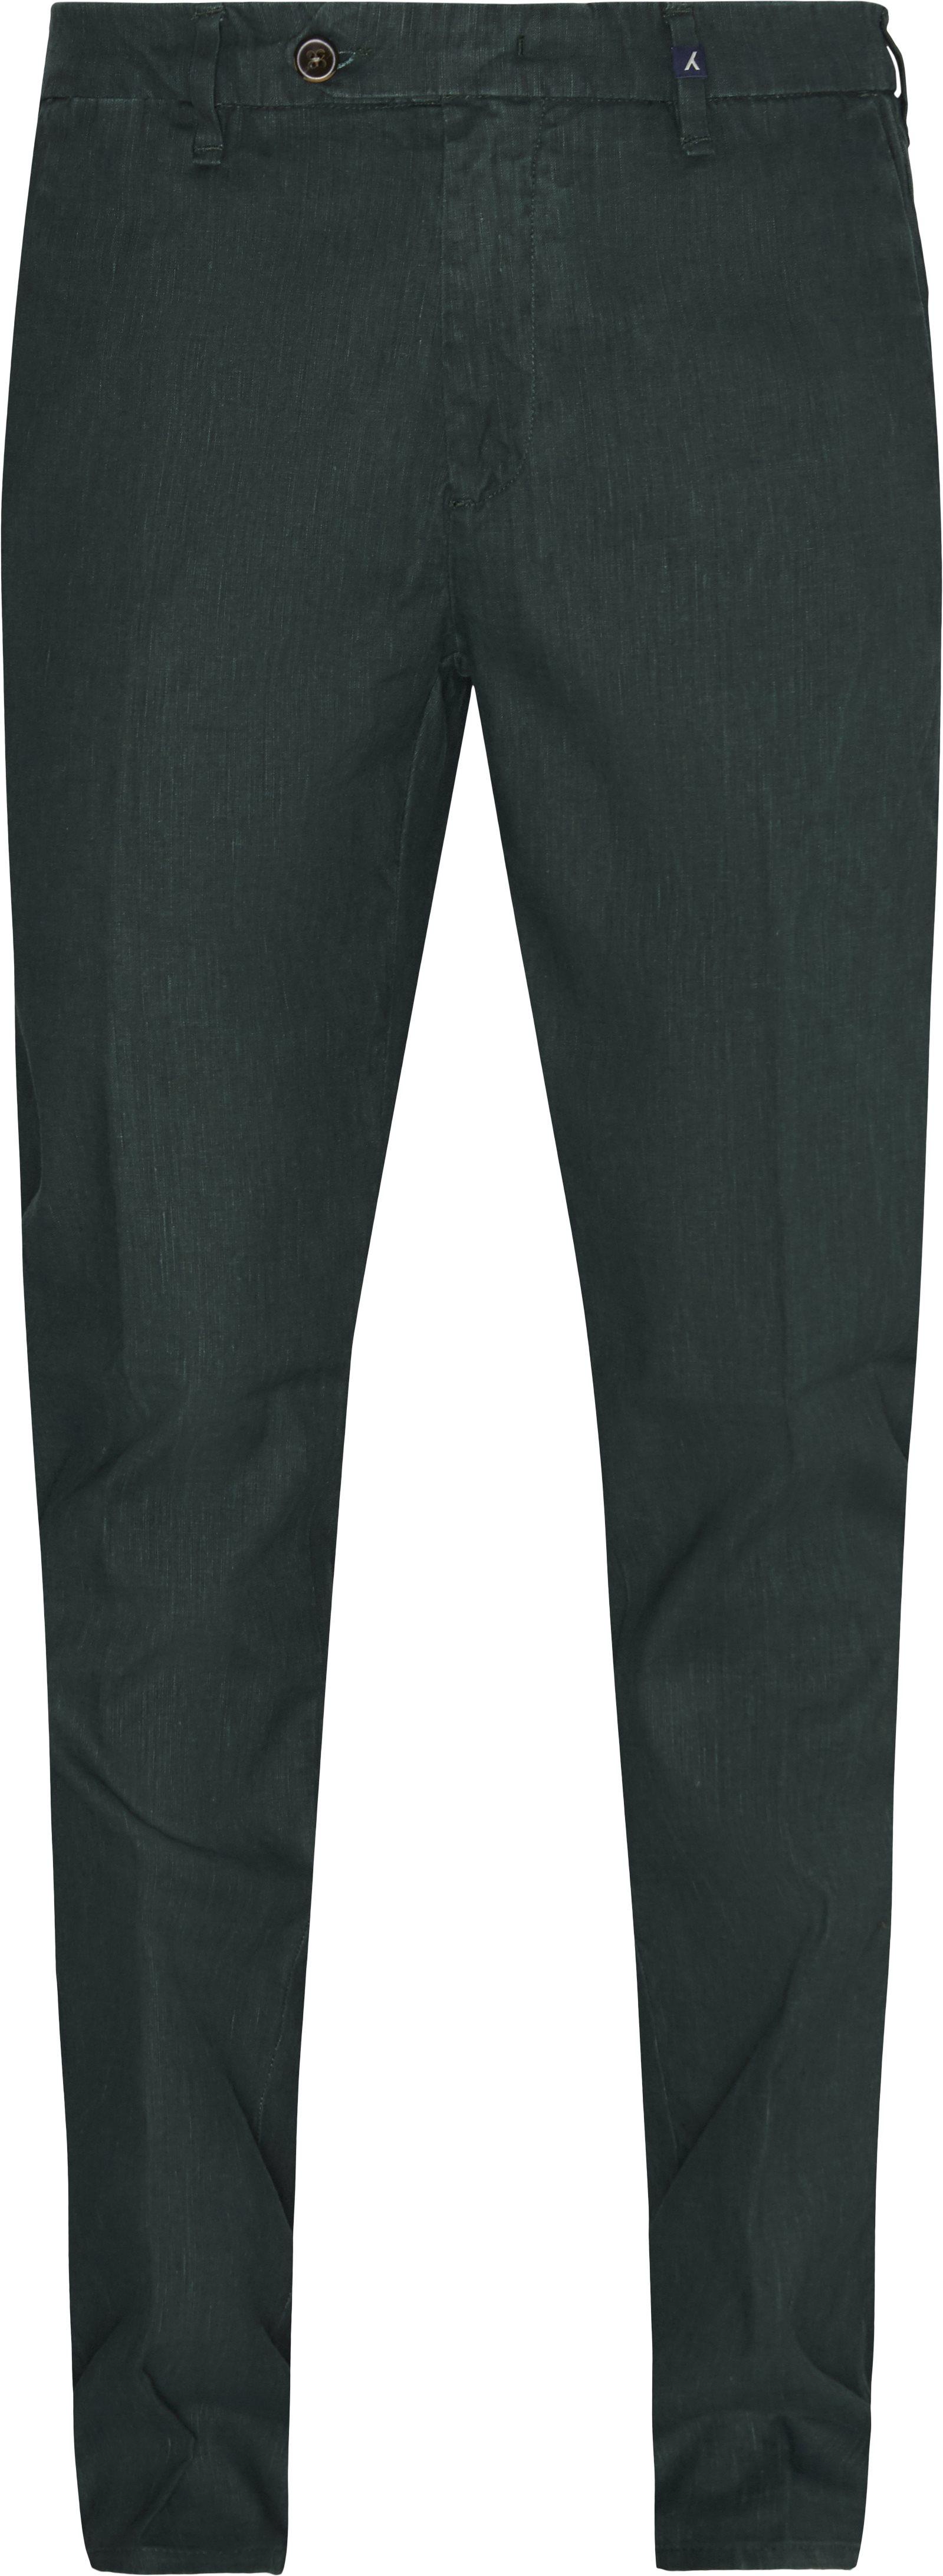 Trousers - Regular fit - Green